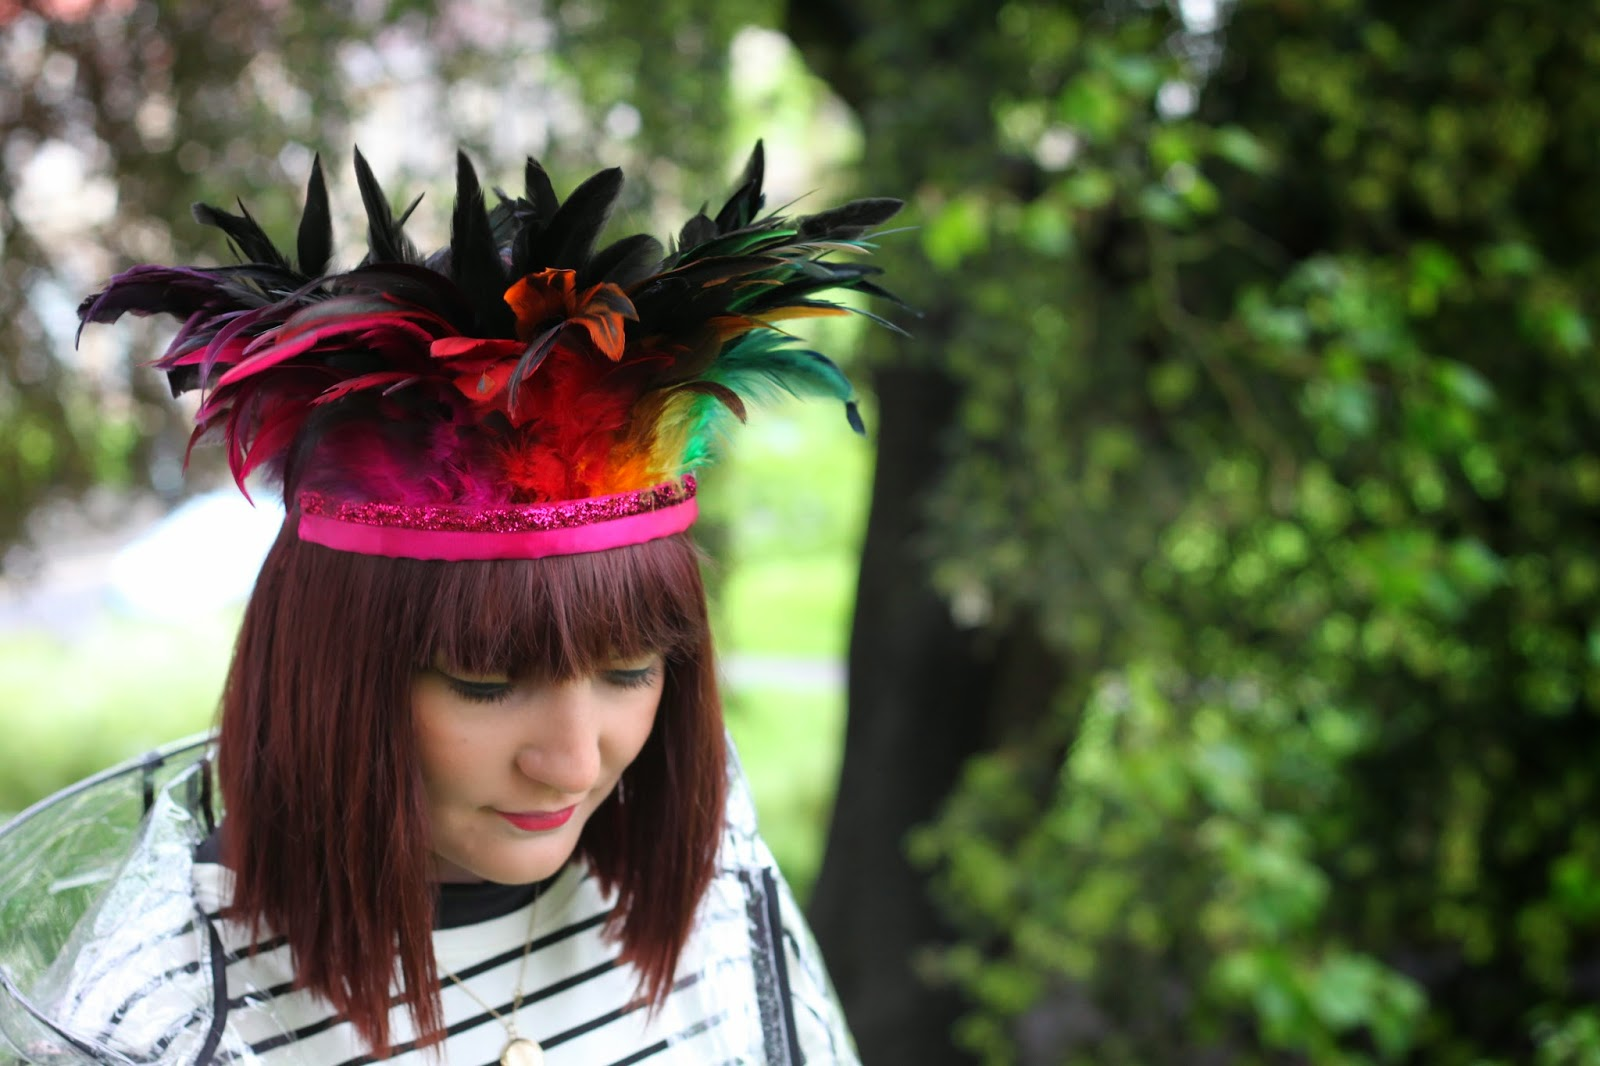 dulcie's feathers, festival, costume, feather headdress, rainbow